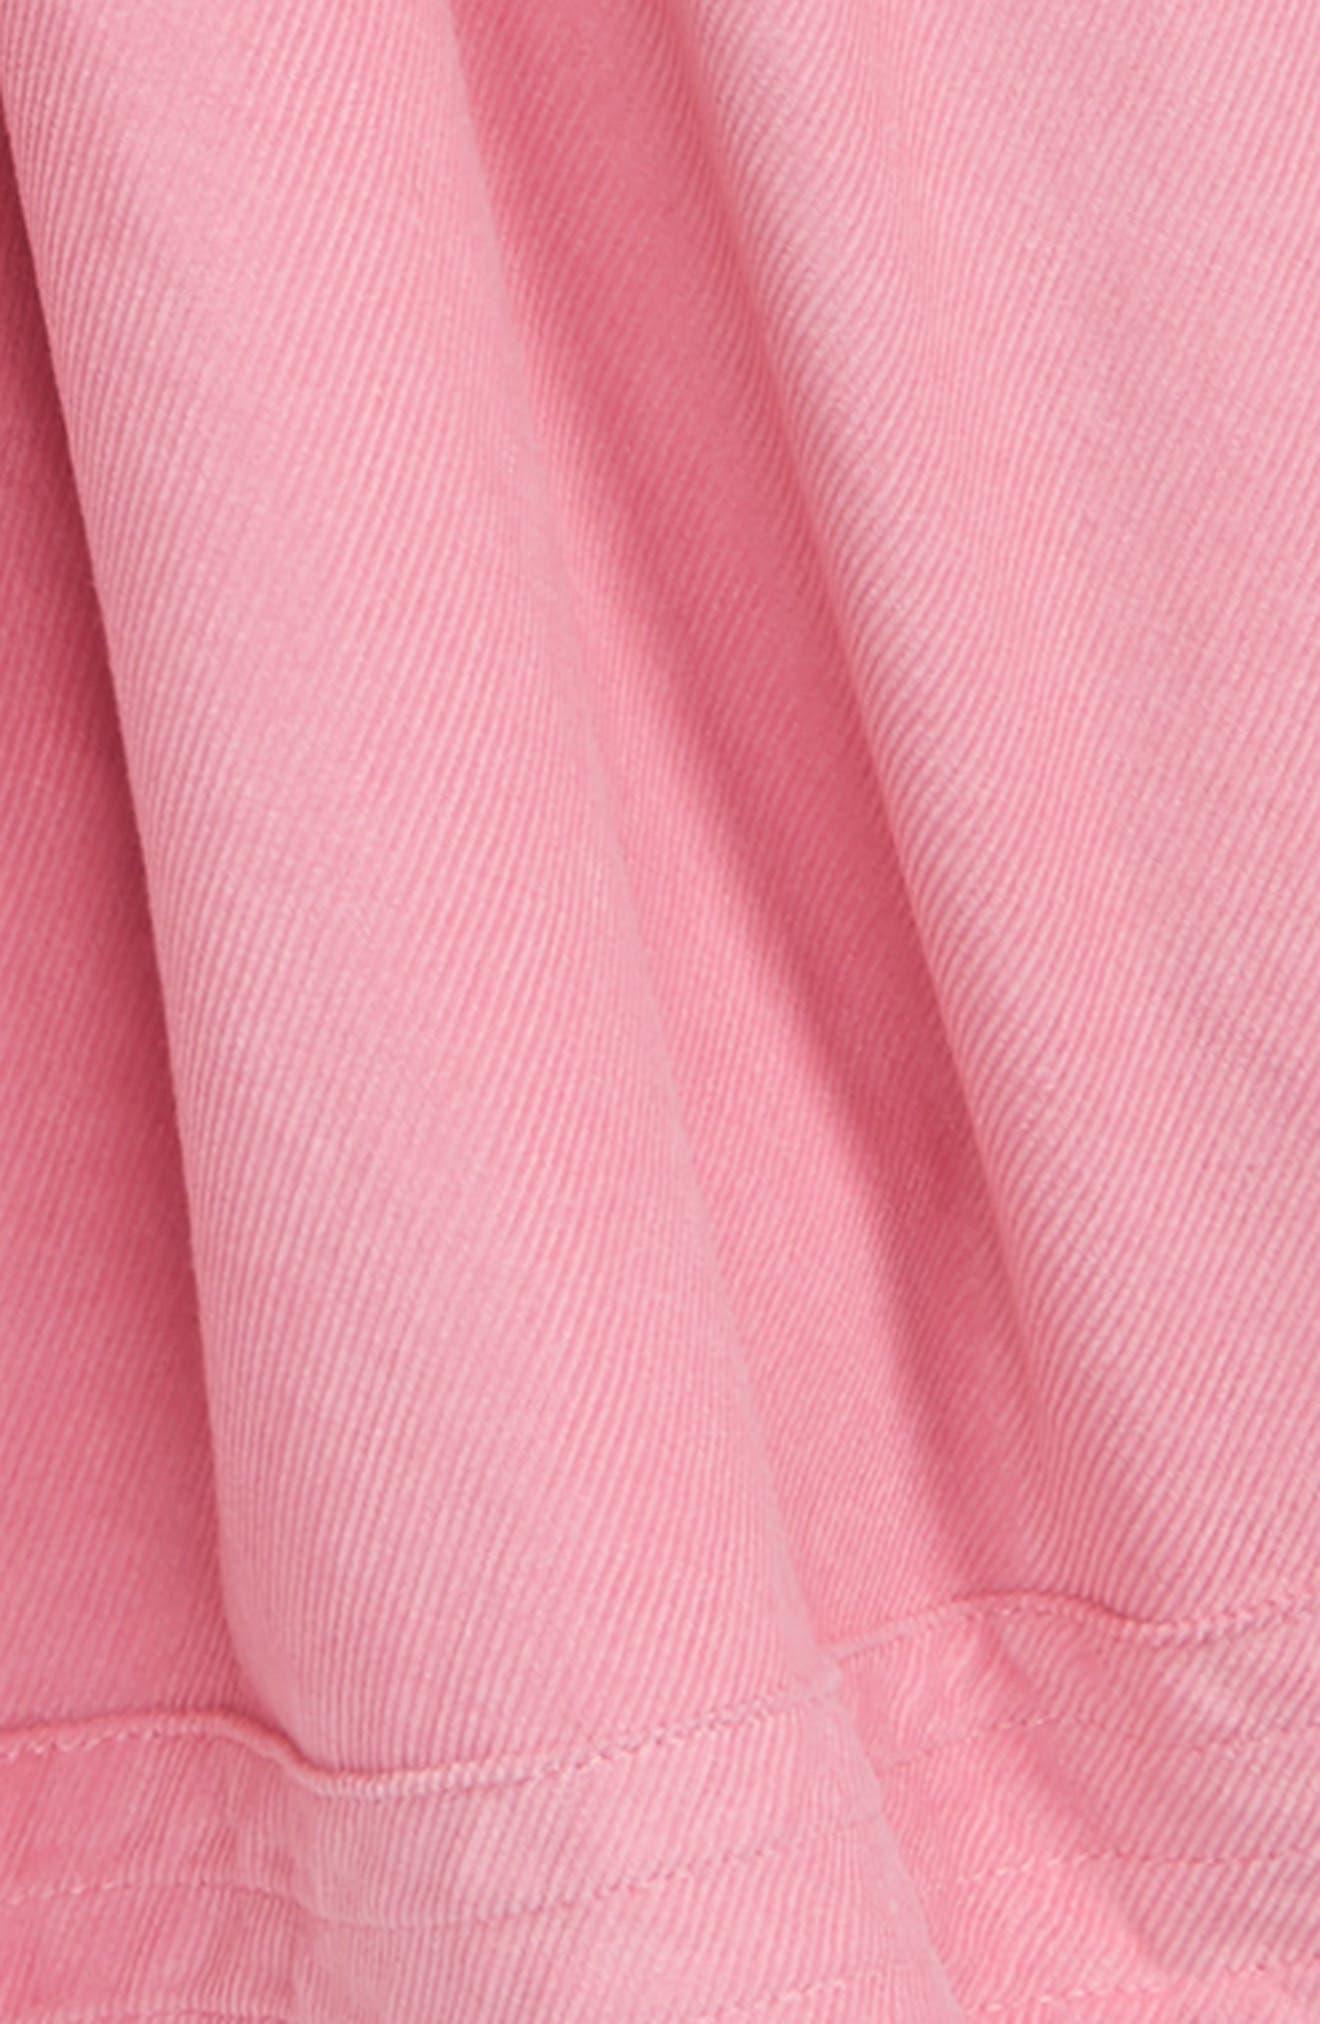 Simple Colorful Corduroy Skirt,                             Alternate thumbnail 2, color,                             664